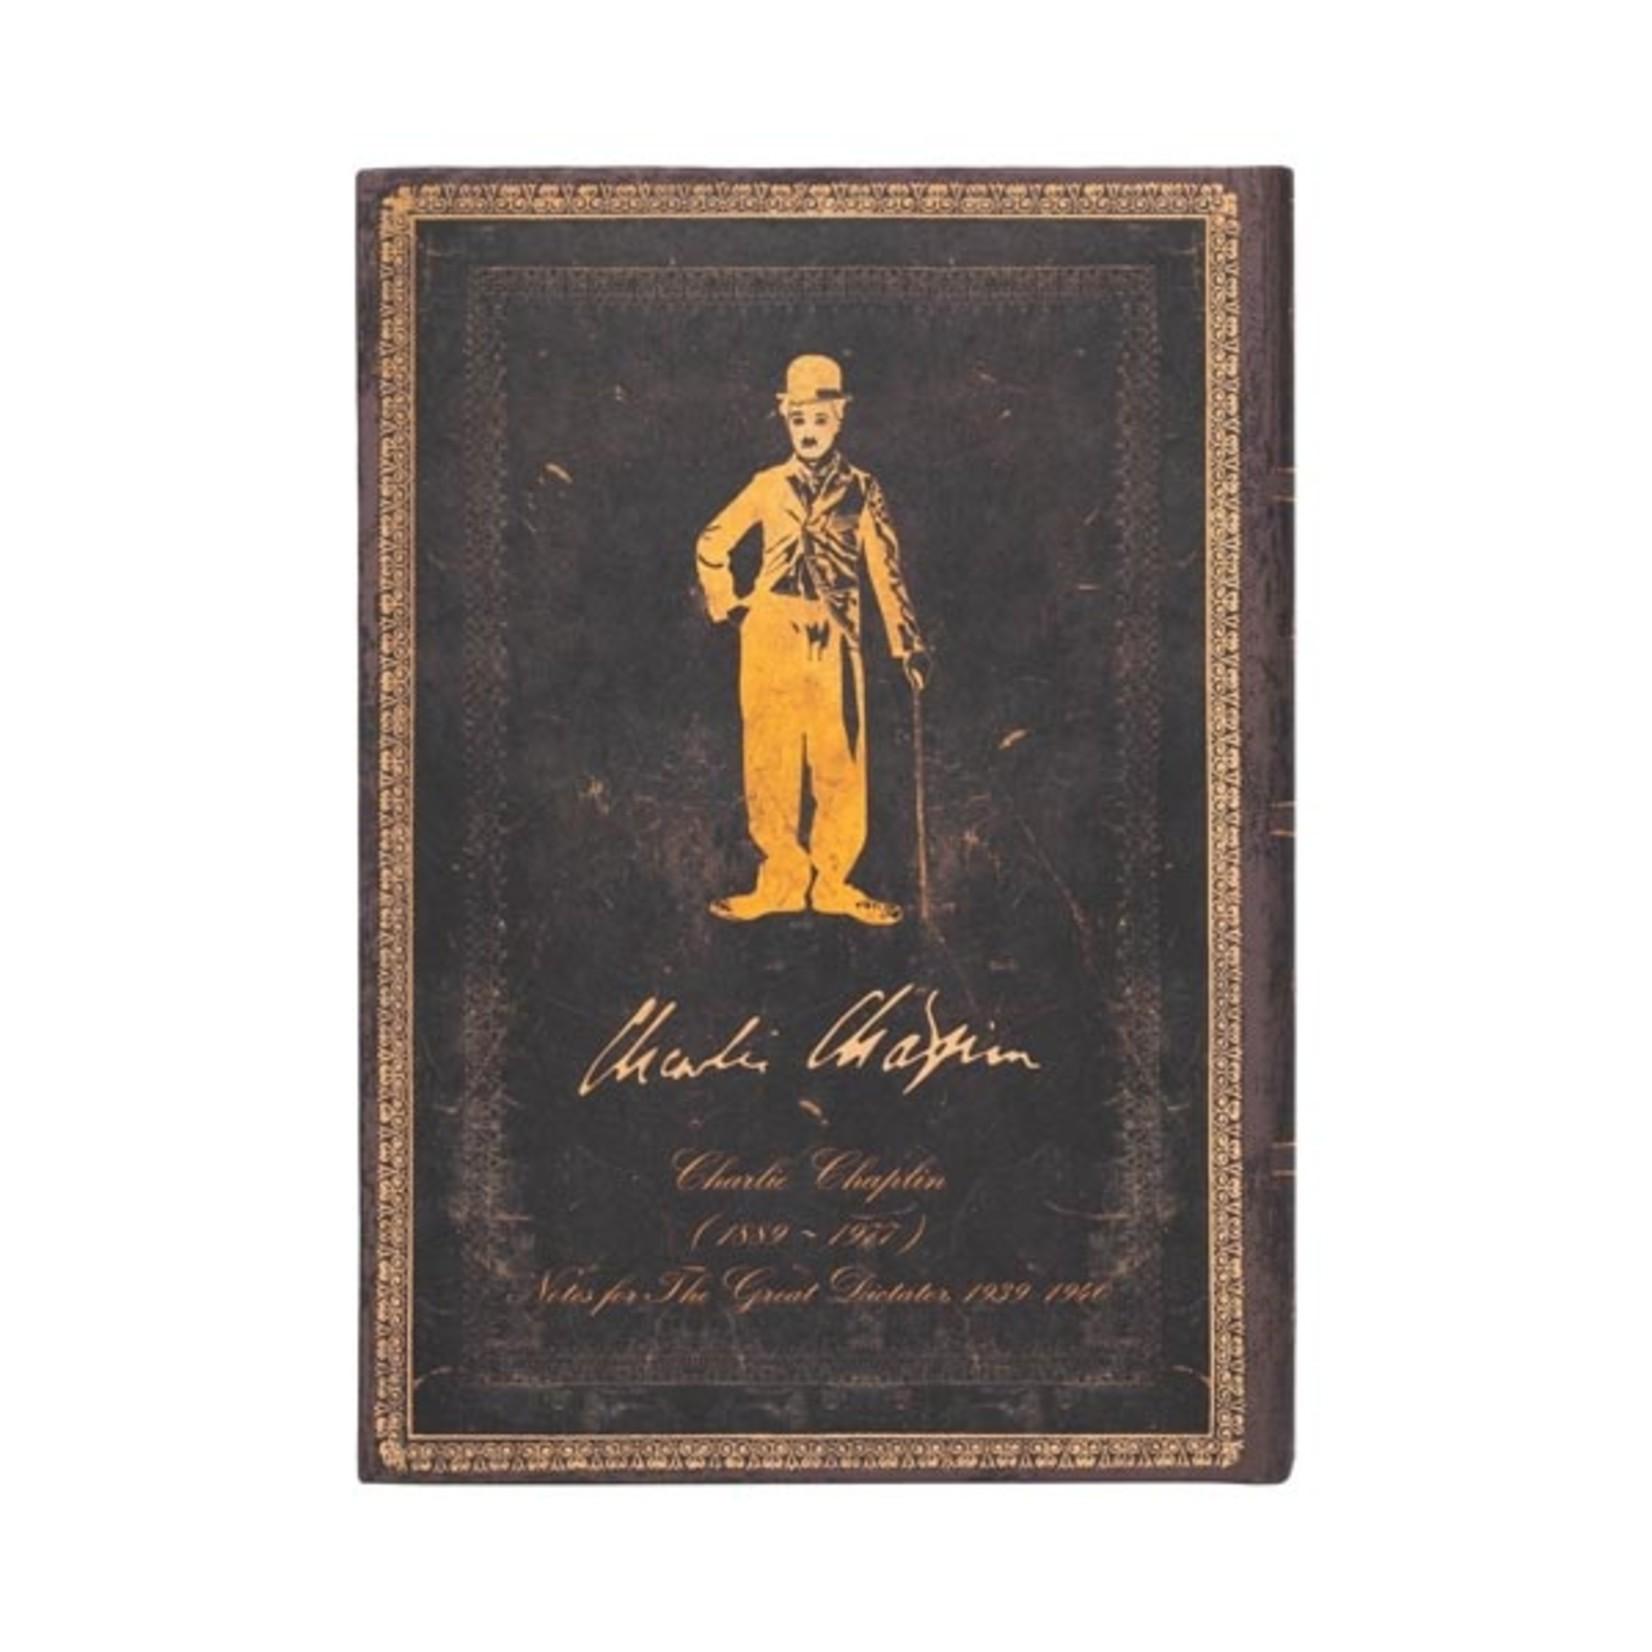 Paperblanks Journal: Celebrating Charlie Chaplin